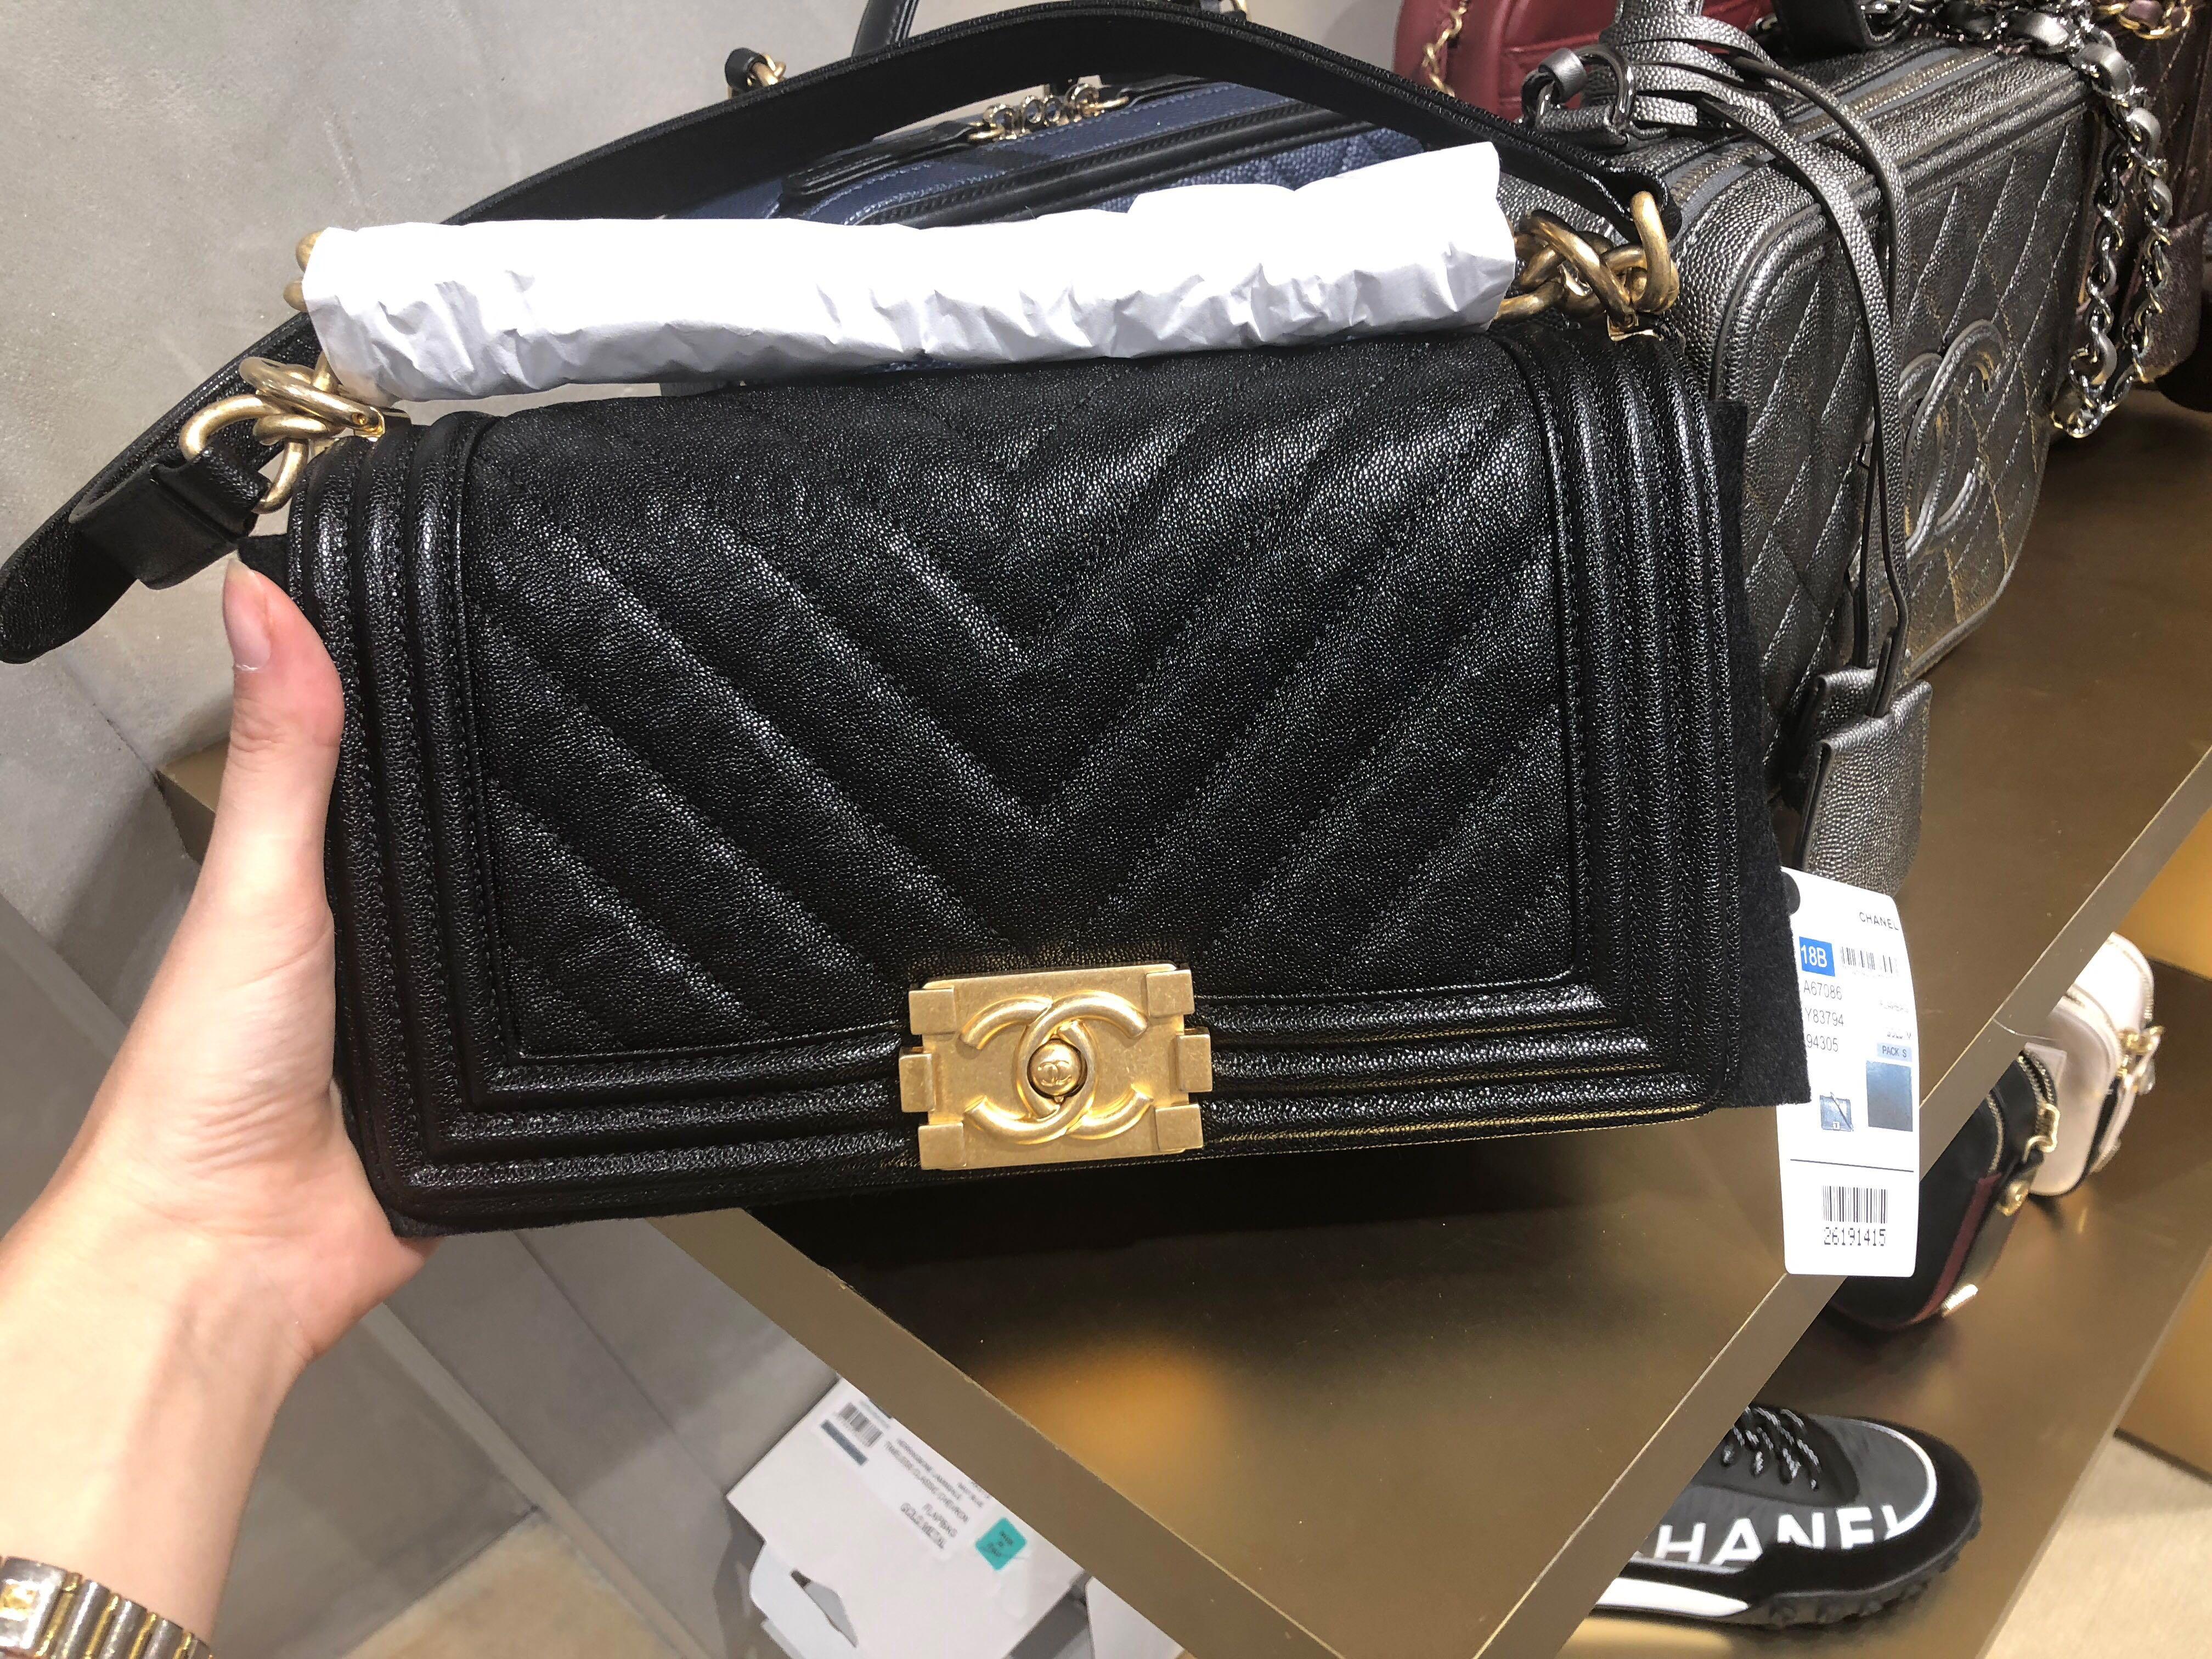 7f426a5b8fce82 Chanel boy chevron caviar, Luxury, Bags & Wallets, Handbags on Carousell